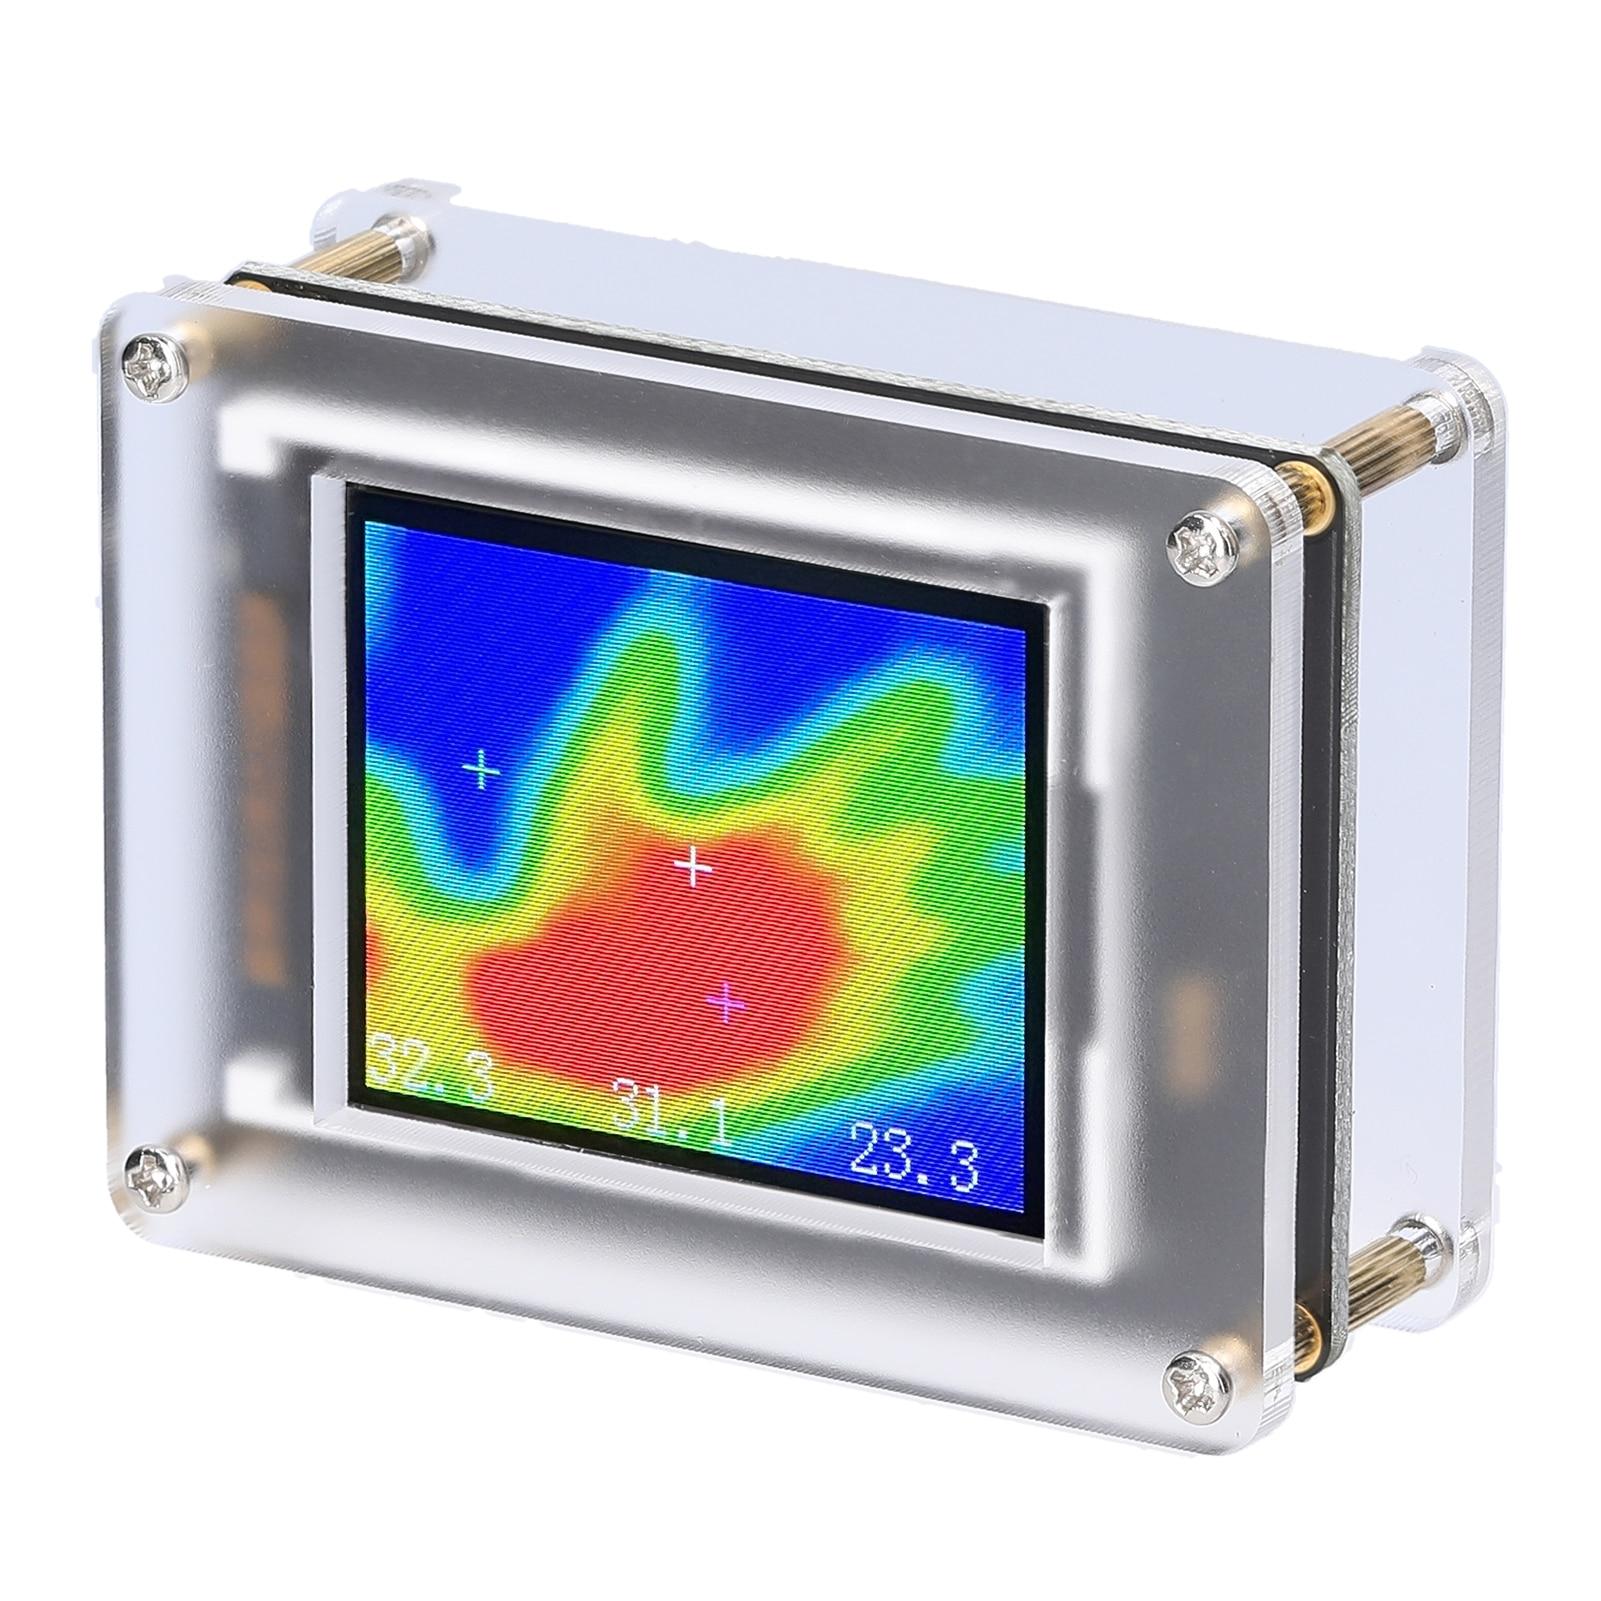 MLX90640 1.8 بوصة الرقمية الأشعة تحت الحمراء الحرارية تصوير TFT عرض يده درجة حرترة تحت الحمراء أجهزة الاستشعار متعددة الأغراض كشف